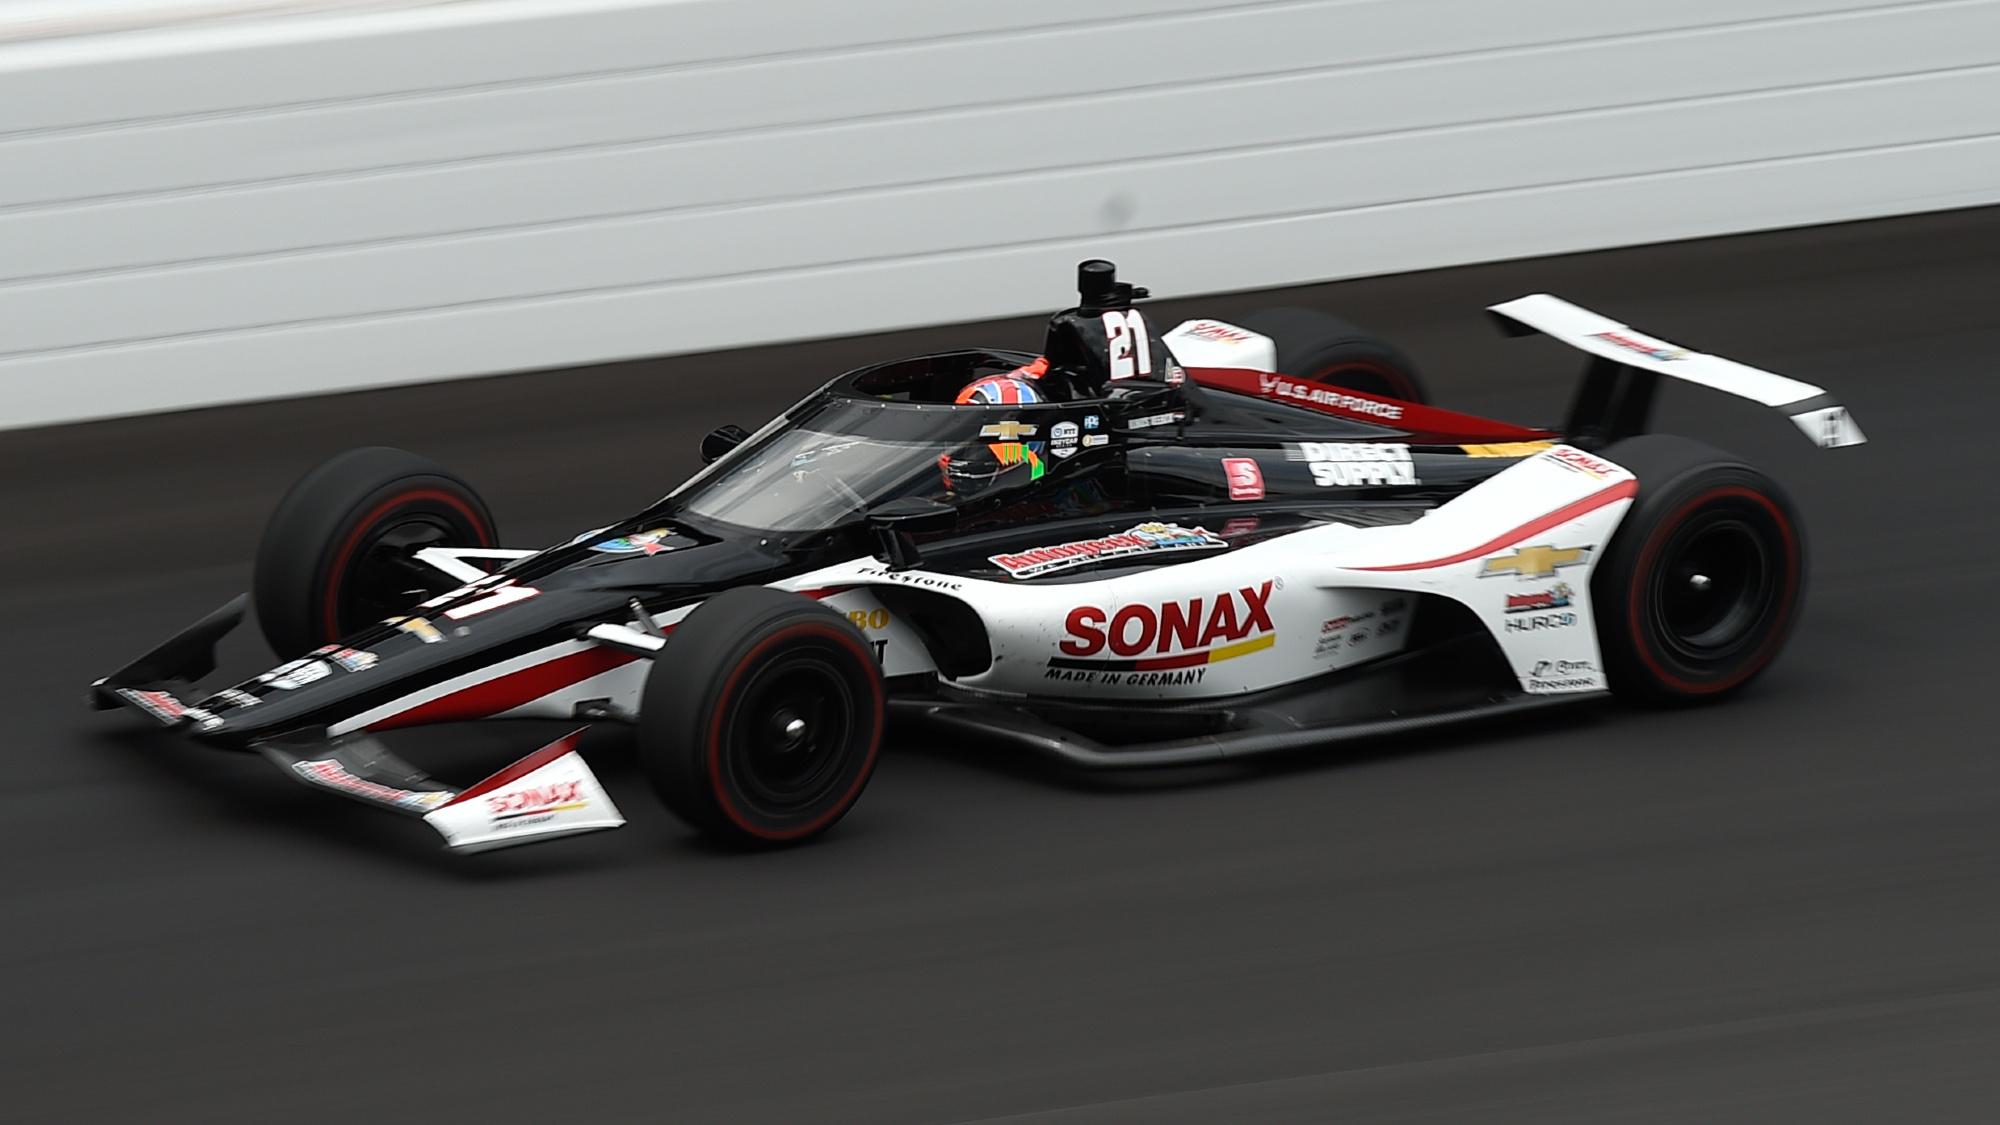 Rinus VeeKay, 2020 Indy 500